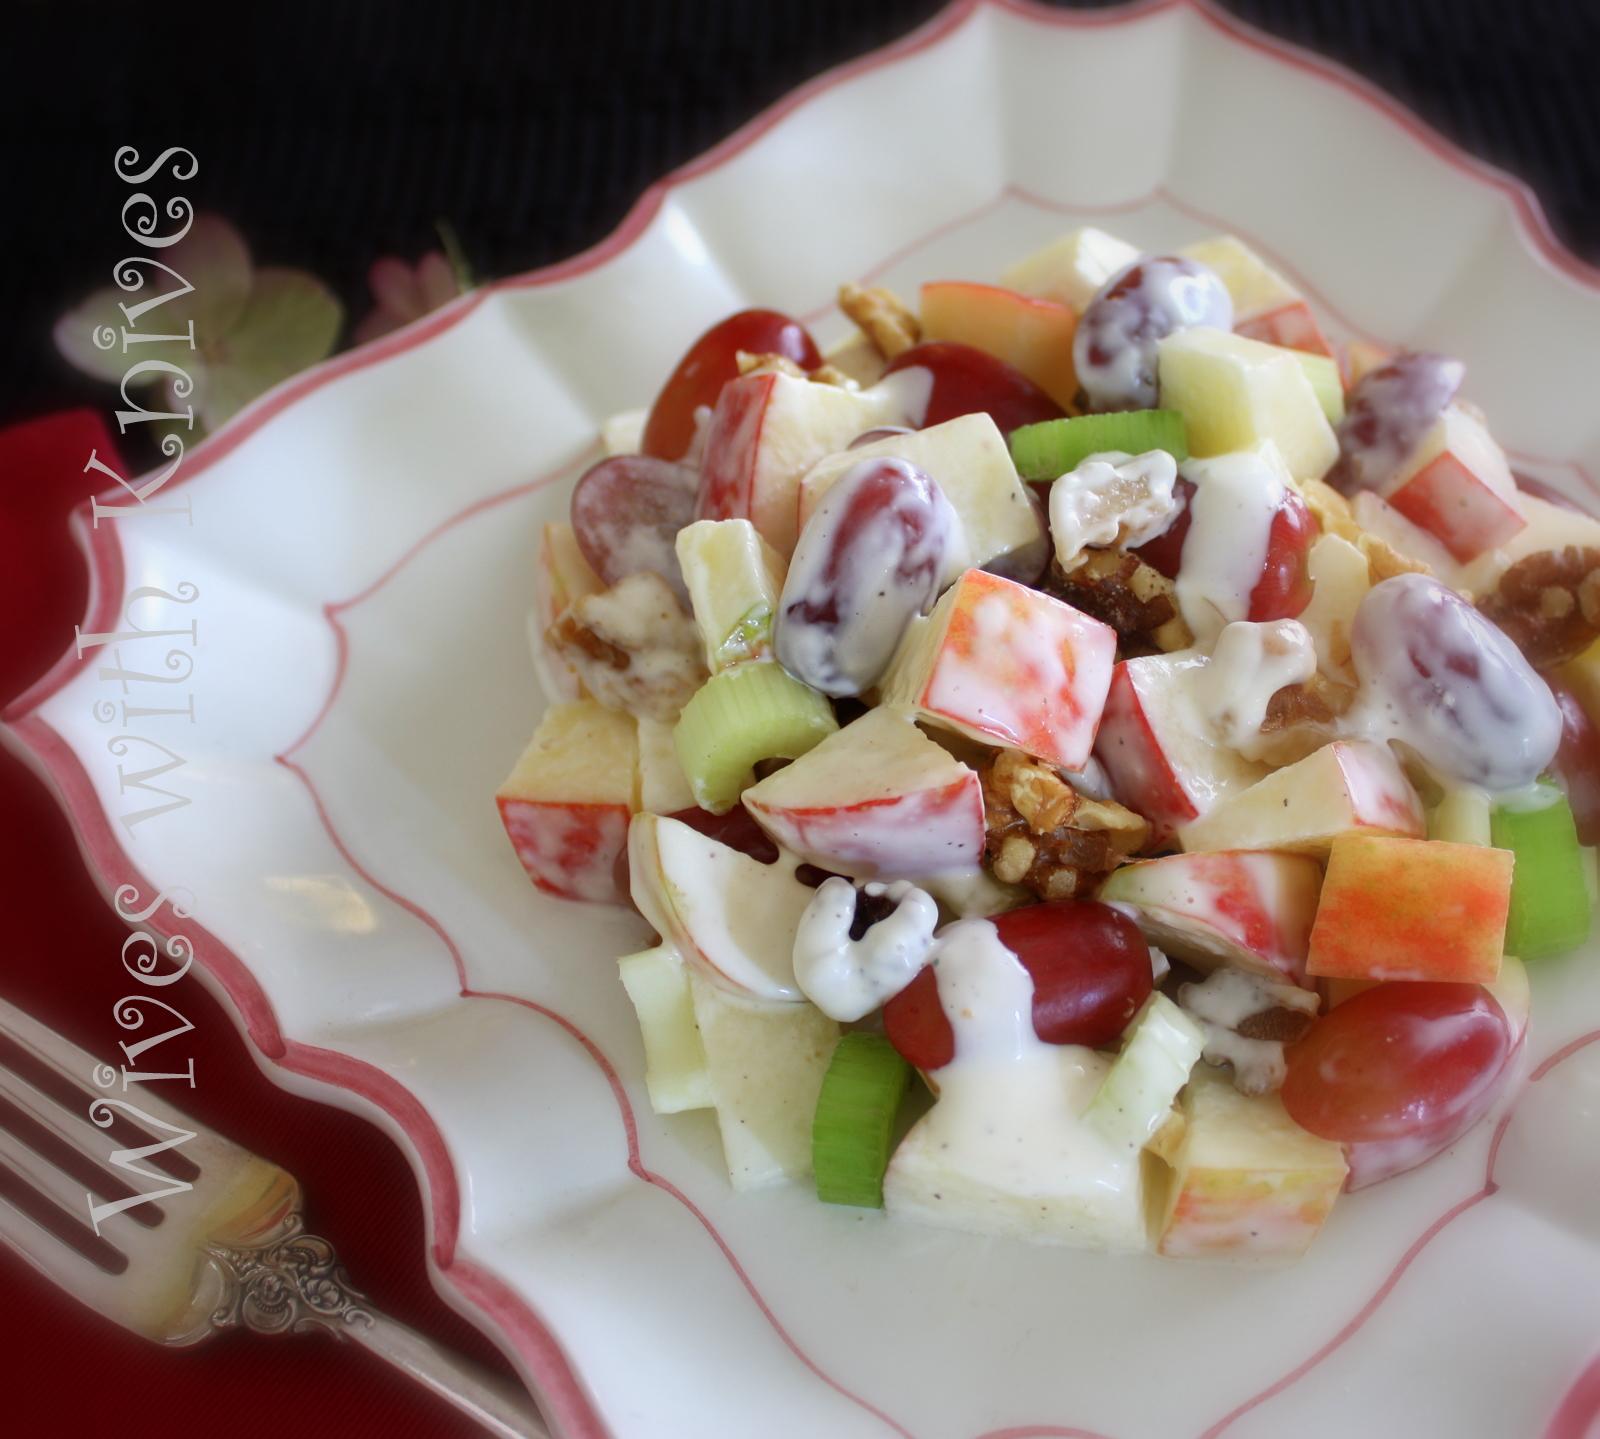 ... salad olivier salad egg salad egg salad blt salad eye salad mostly not